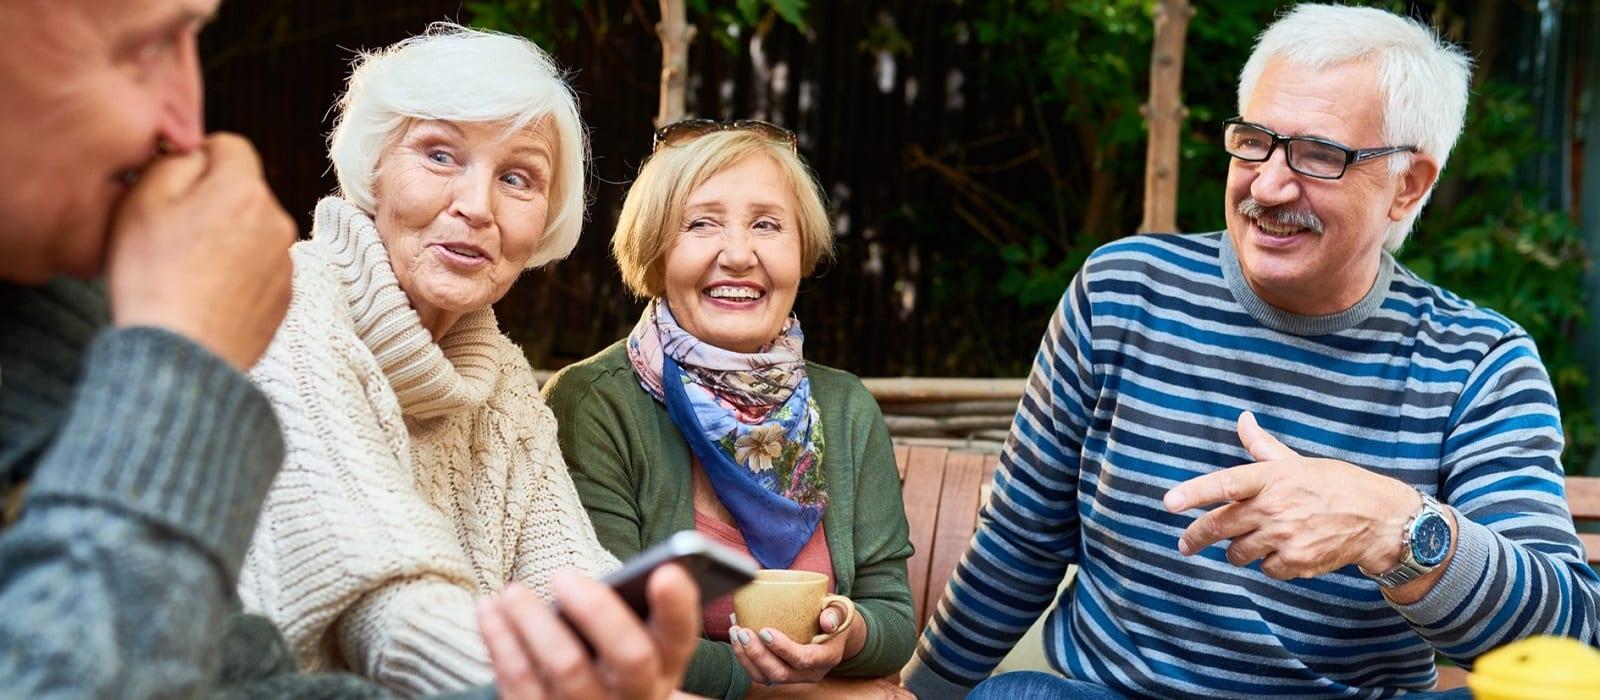 folksam-pensioner-elderly-retirement